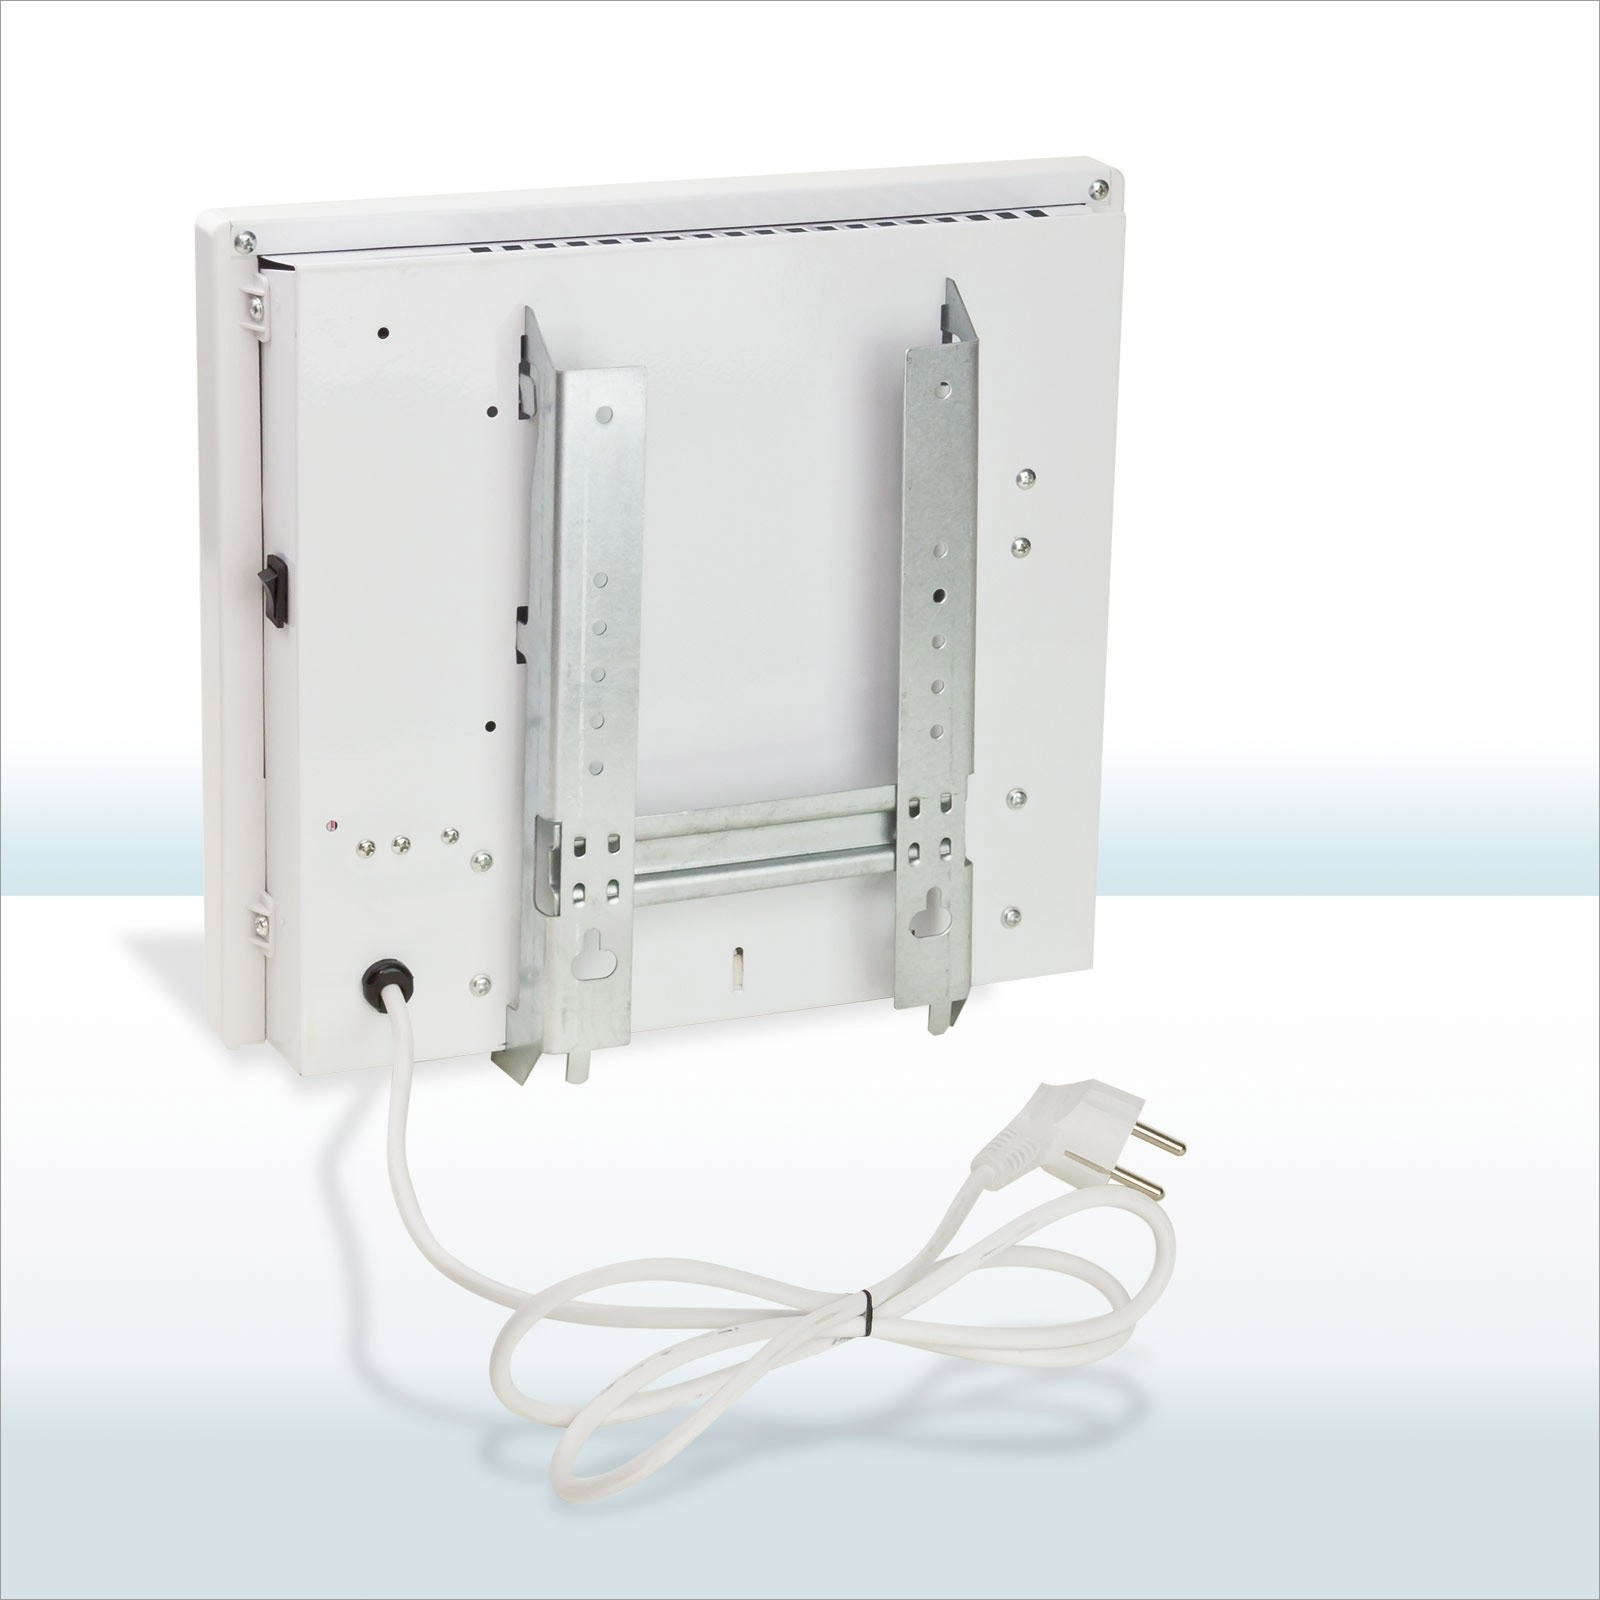 elektro flach heizk rper frost w chter 400w wand paneel heizer heizung konvektor ebay. Black Bedroom Furniture Sets. Home Design Ideas